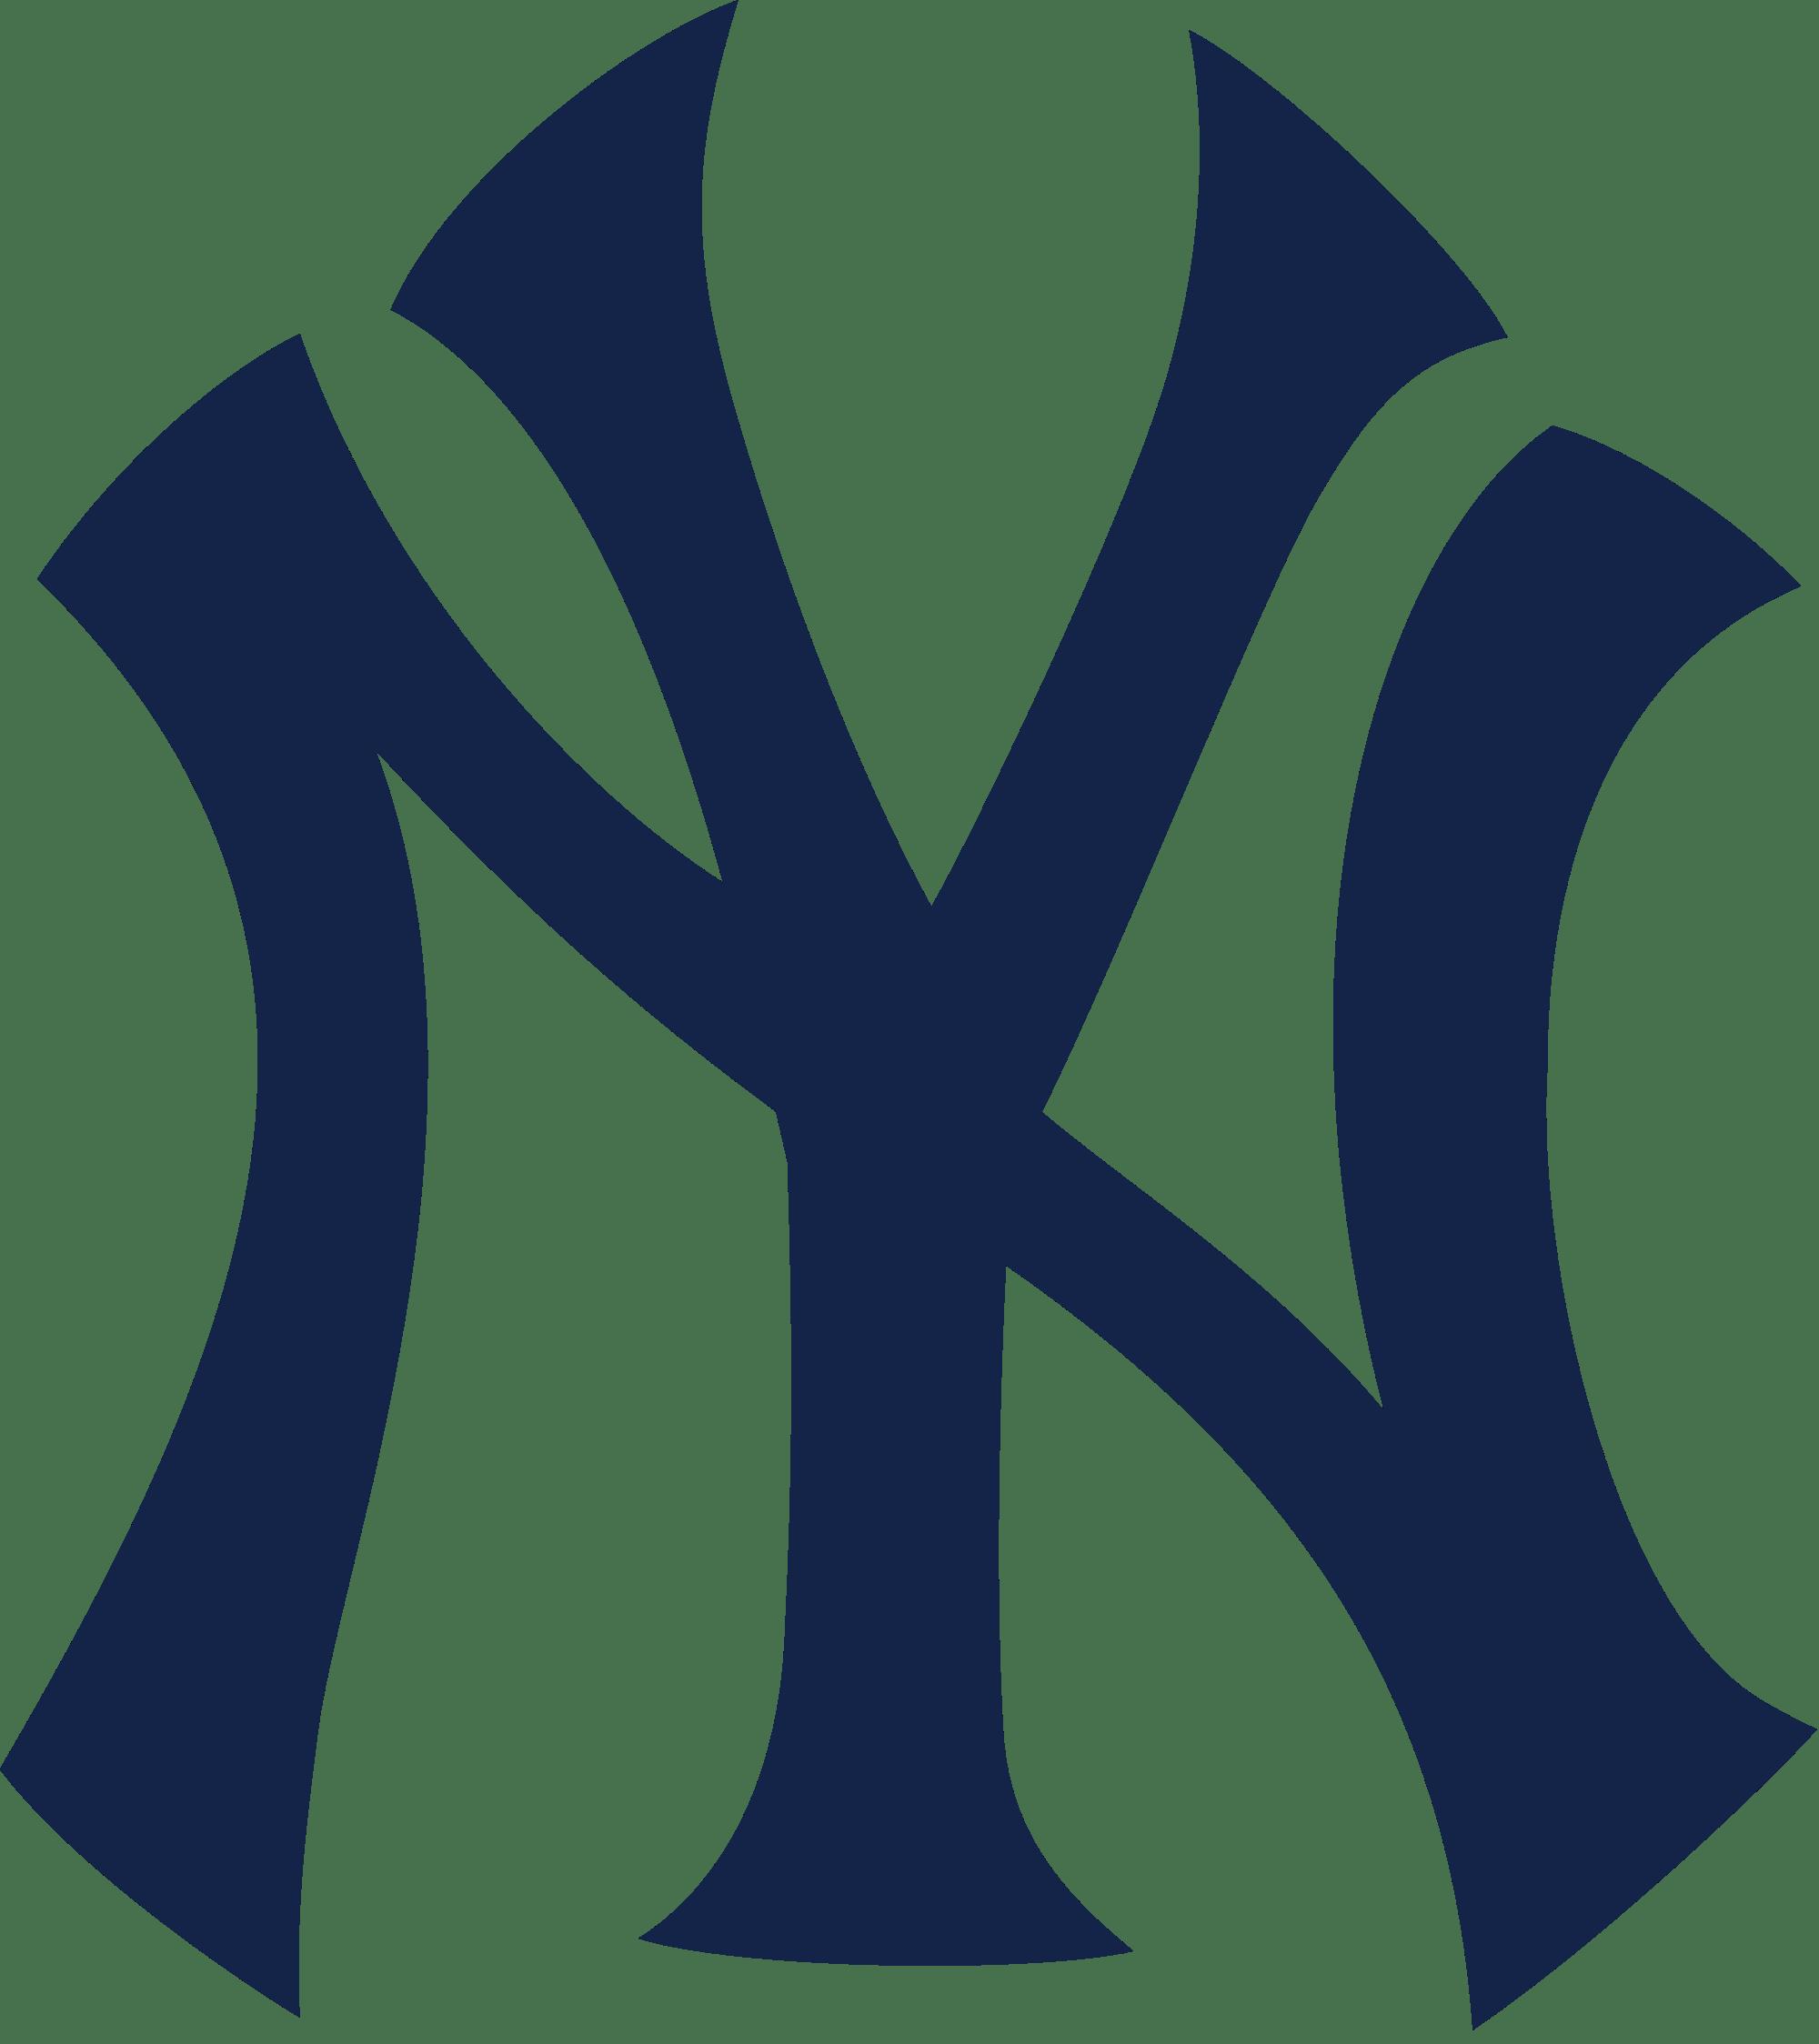 2000x2248 New York Png Desktop Backgrounds